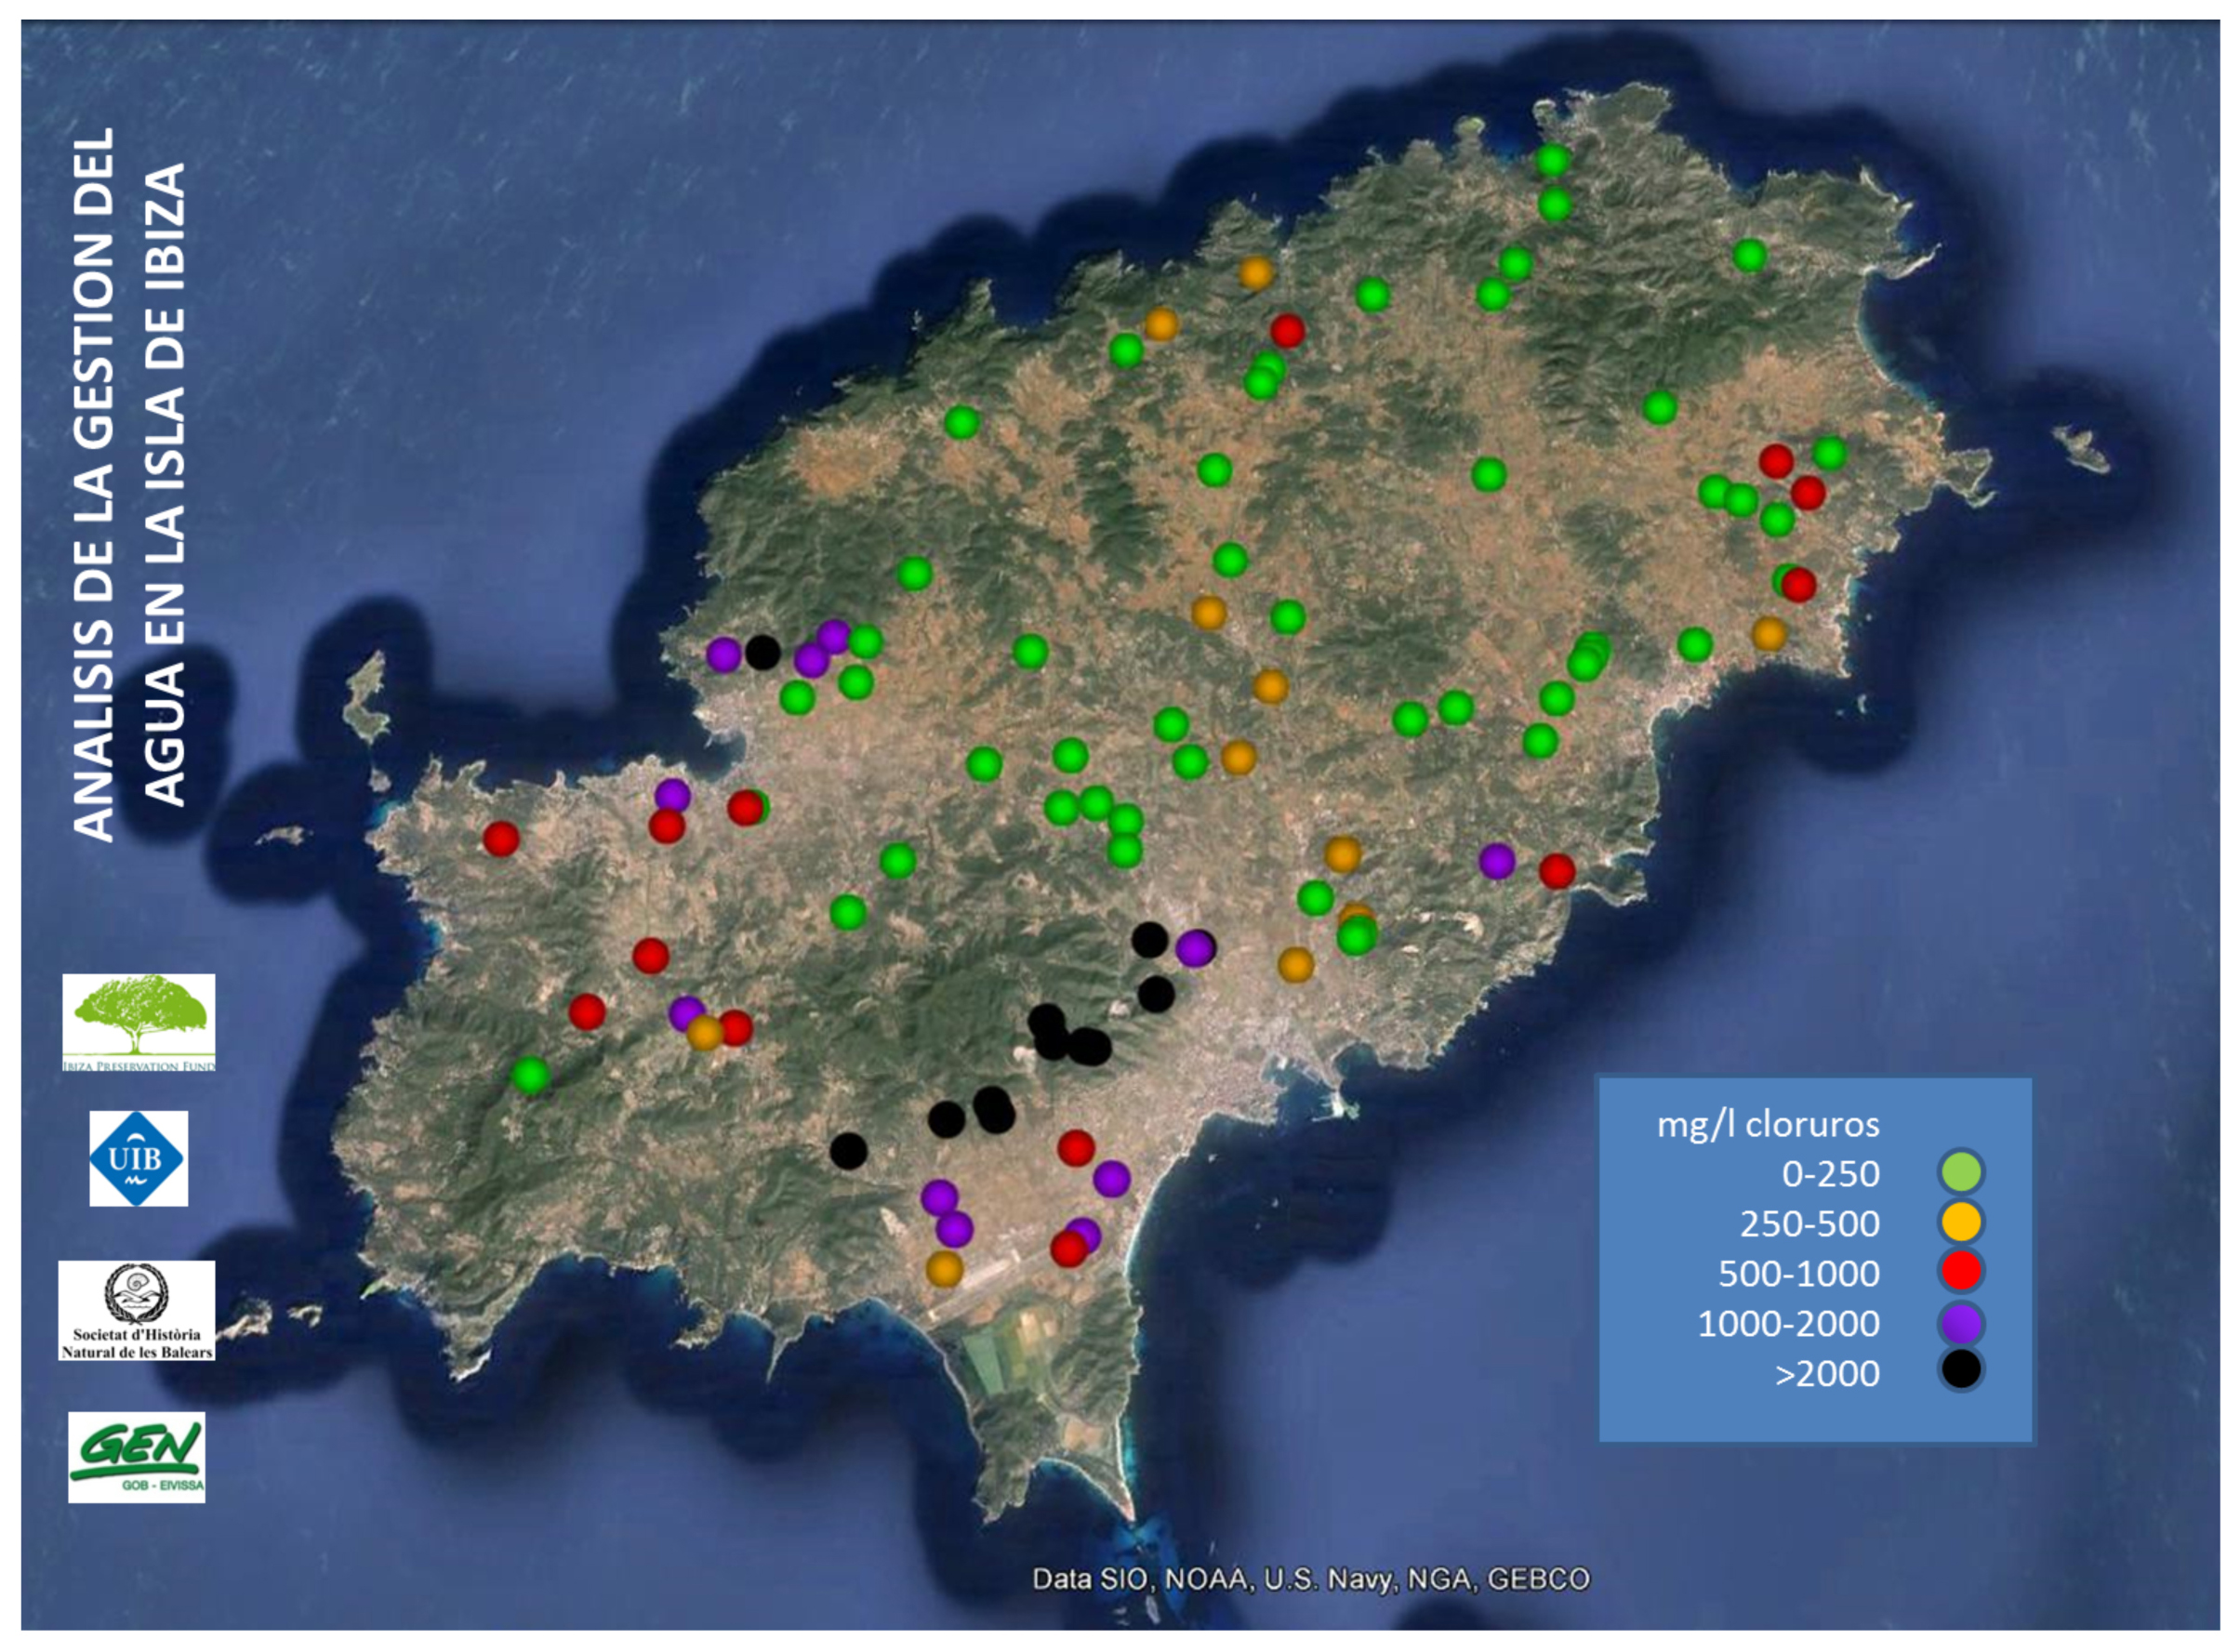 Ibiza Water Management Report